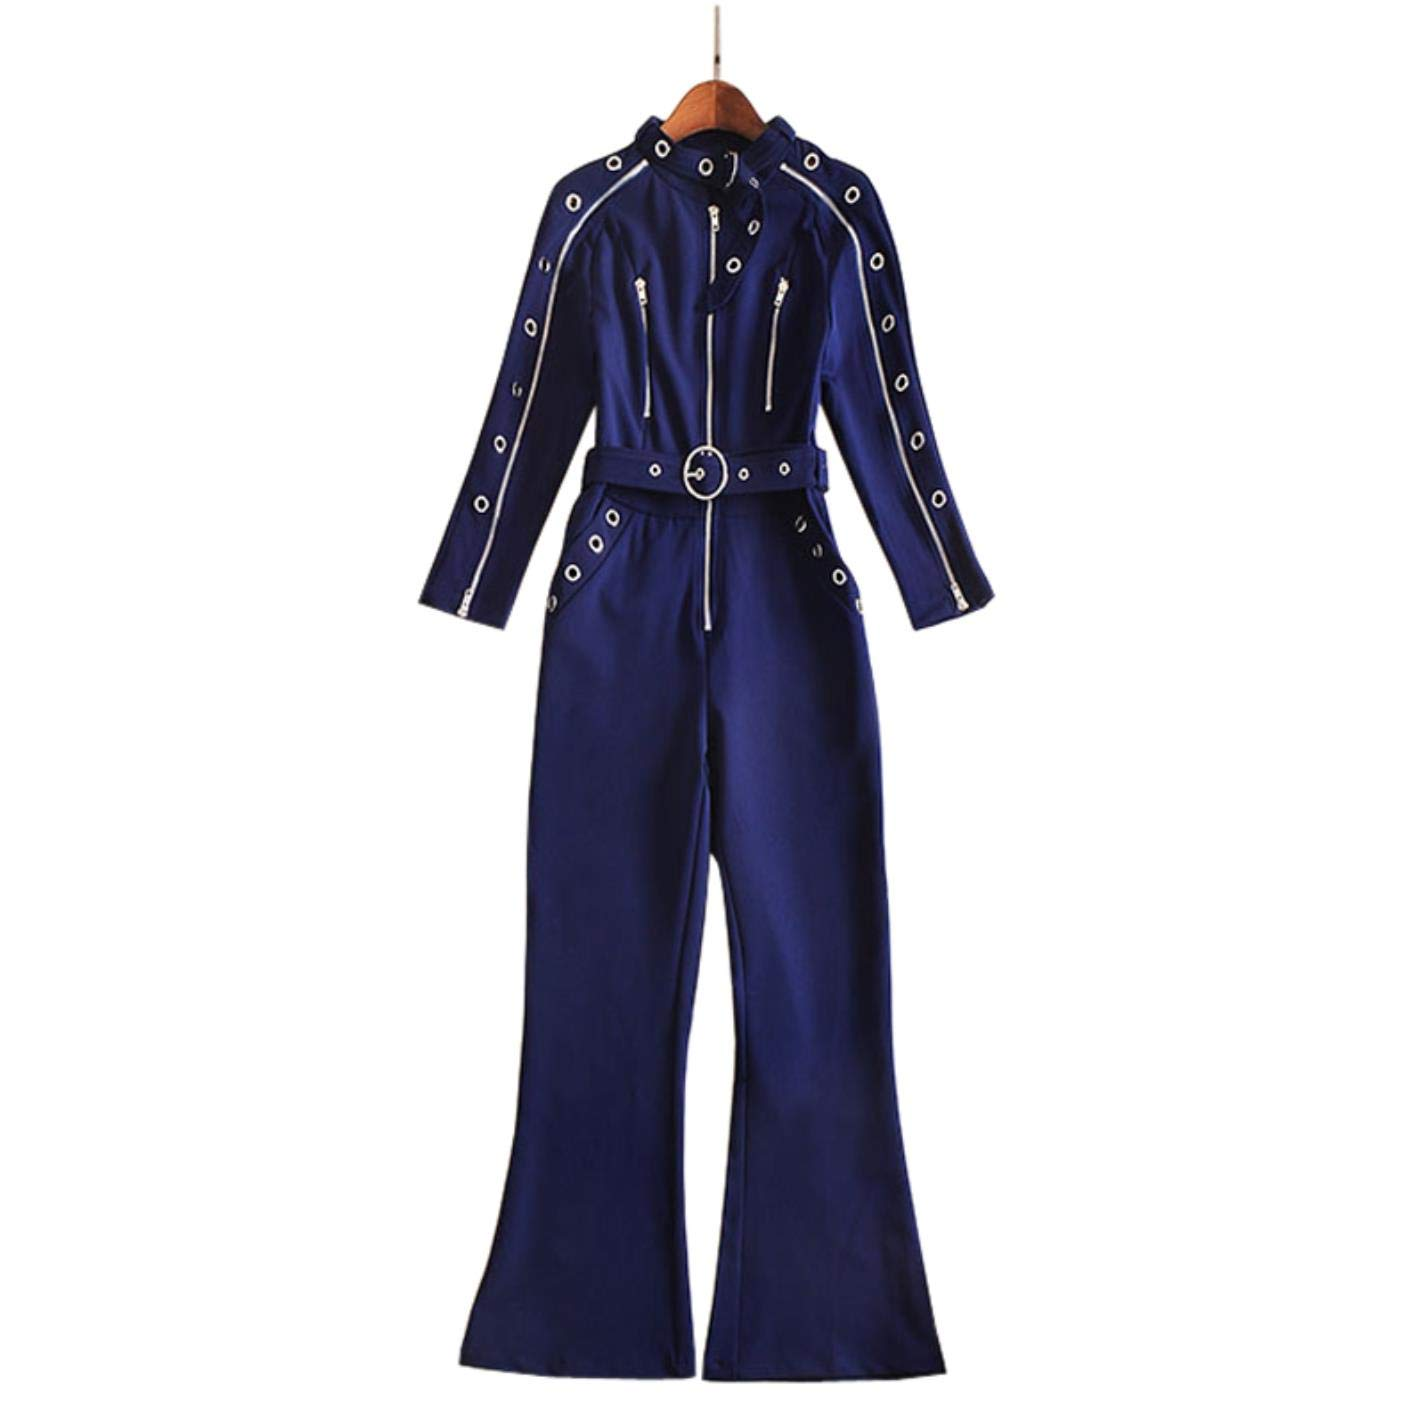 KmjHe Women Tight Plaid Zip Buckle High Collar Long Sleeve Flare Pants Set